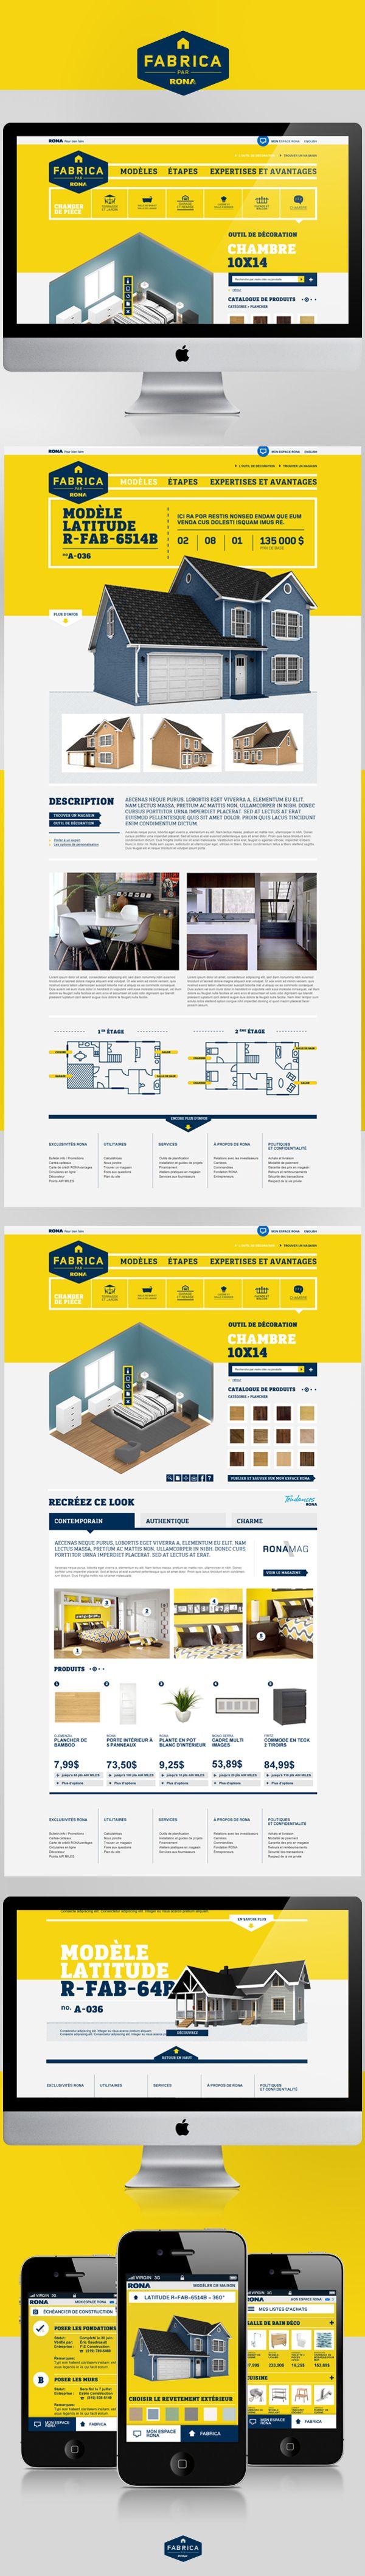 Fabrica by Elisabeth Dumont-Mackay Website design layout. Inspirational UX/UI design sample. Visit us at: www.sodapopmedia.com #WebDesign #UX #UI #WebPageLayout #DigitalDesign #Web #Website #Design #Layout